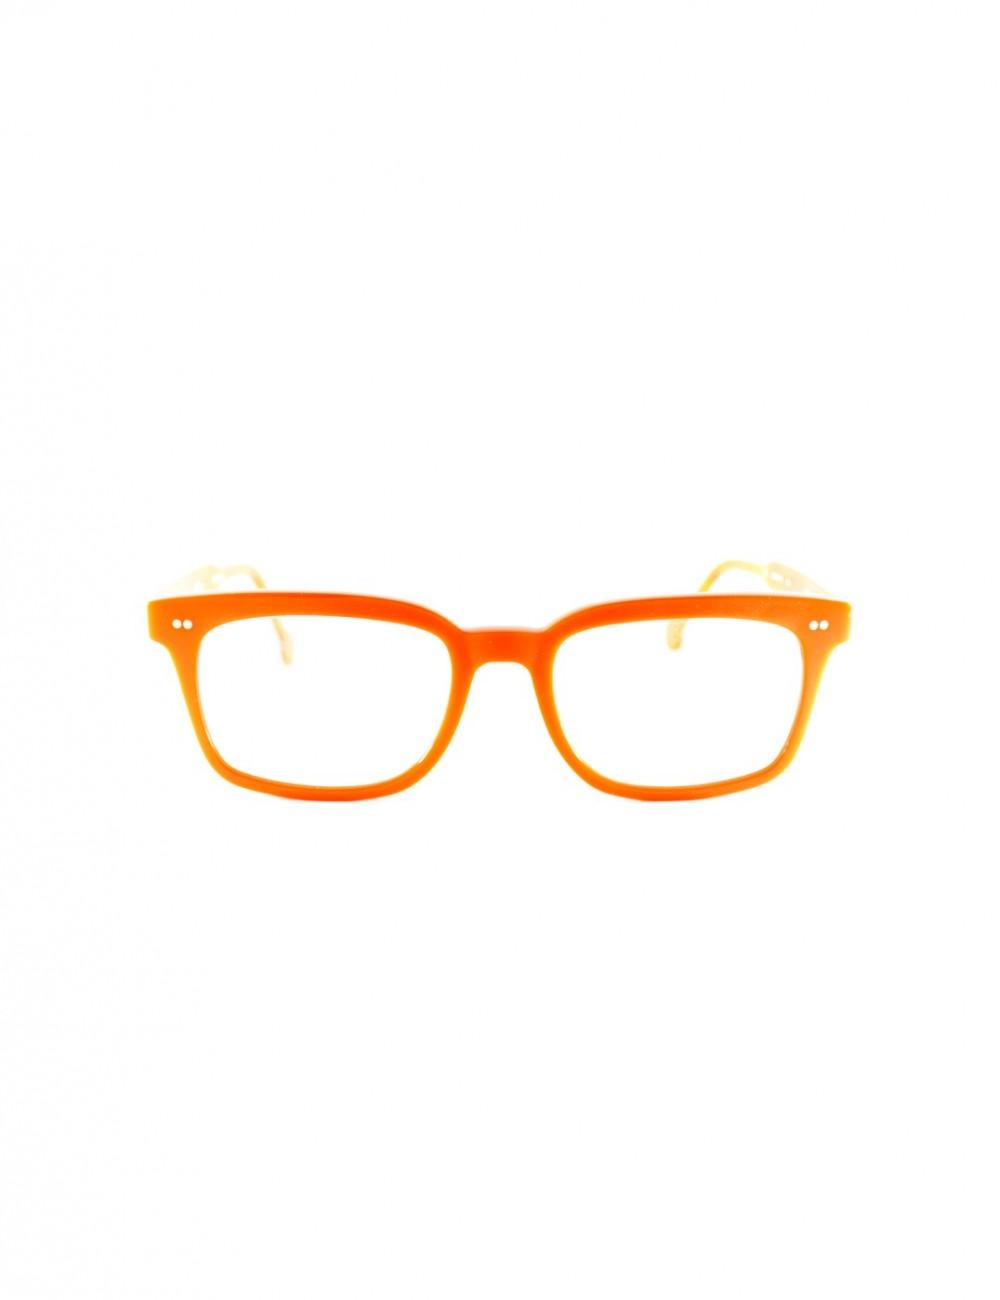 L.A. Eyeworks L.A. Eyeworks Gottlieb 251161  EyewearShop Online